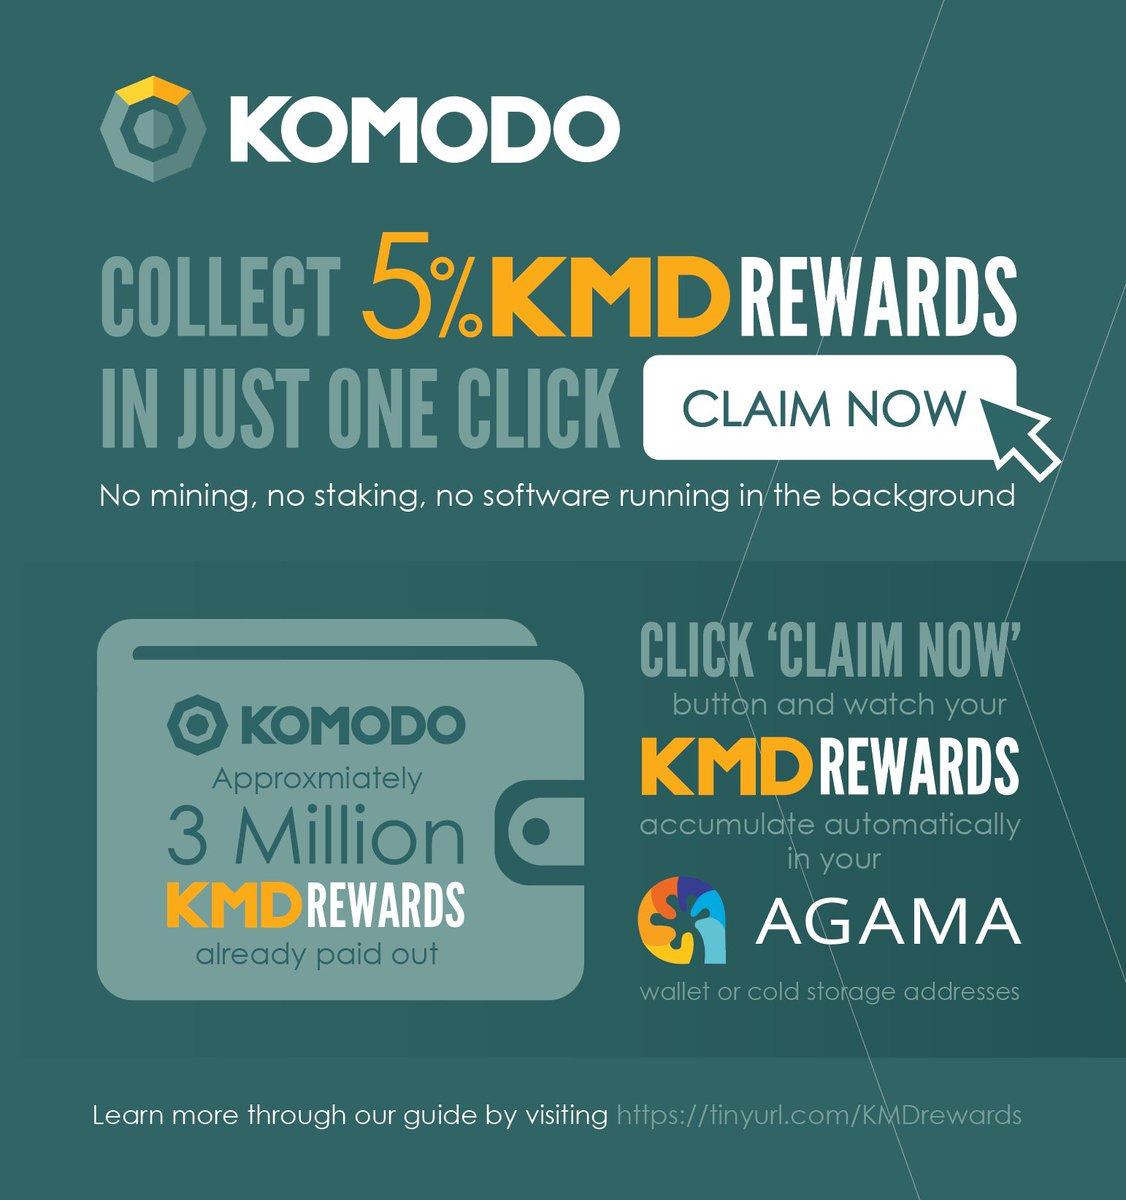 kmd smartcare app